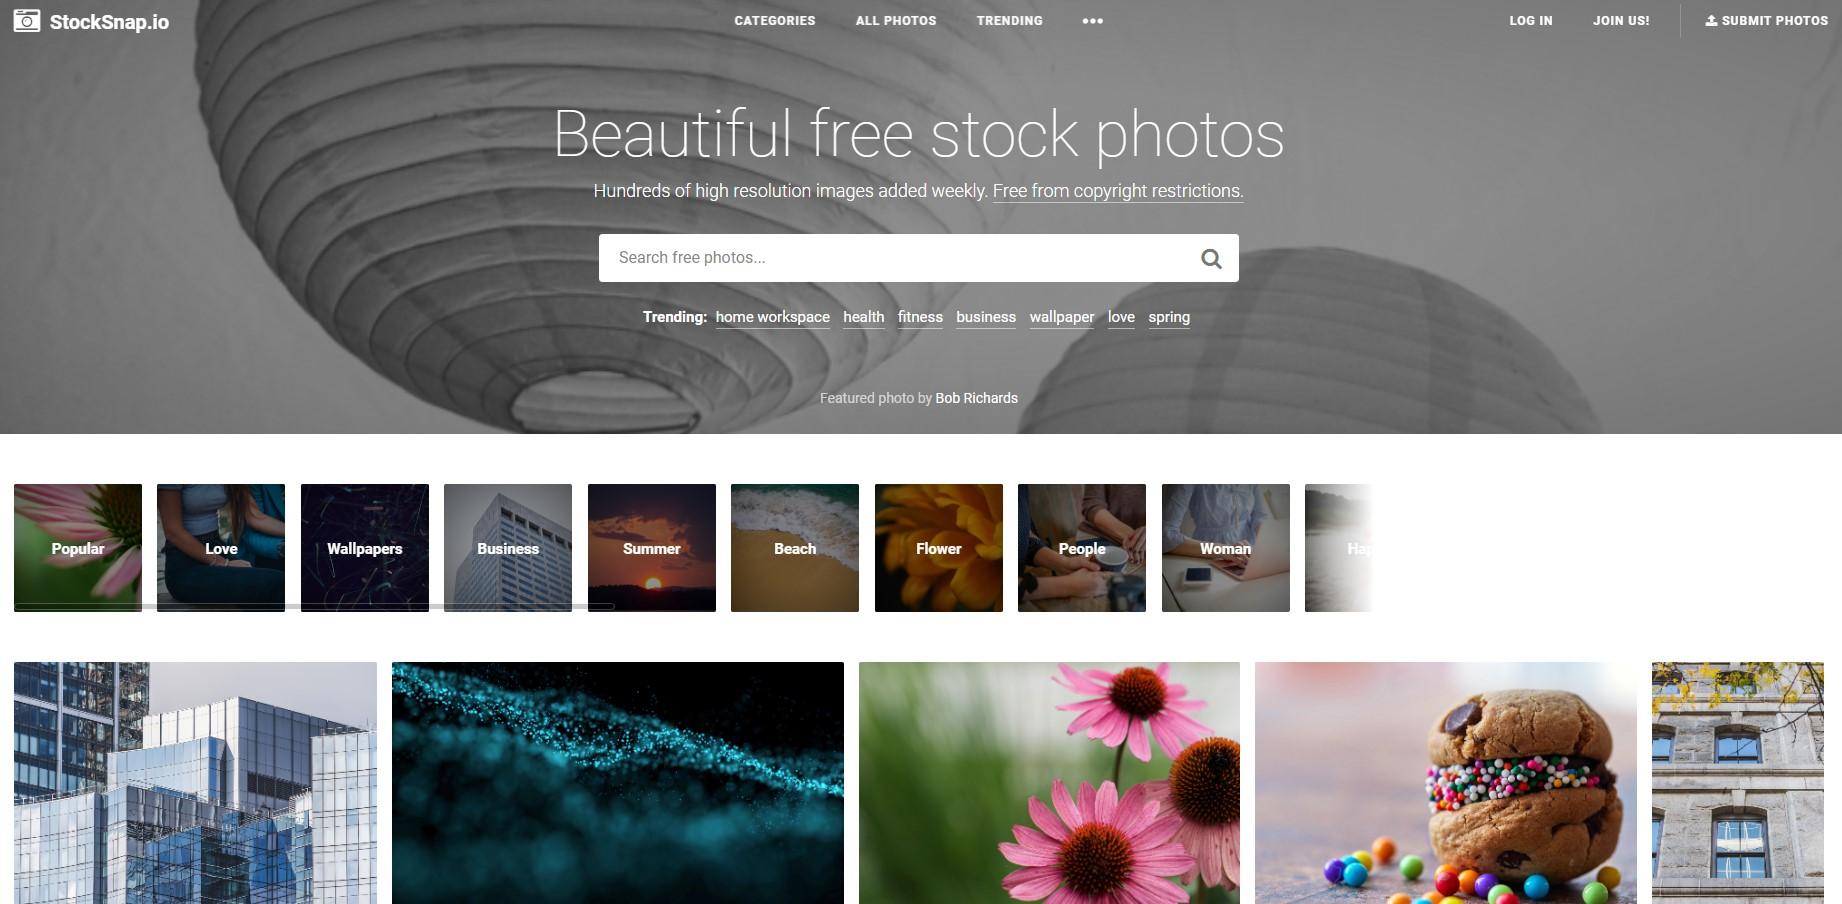 StockSnap 사이트